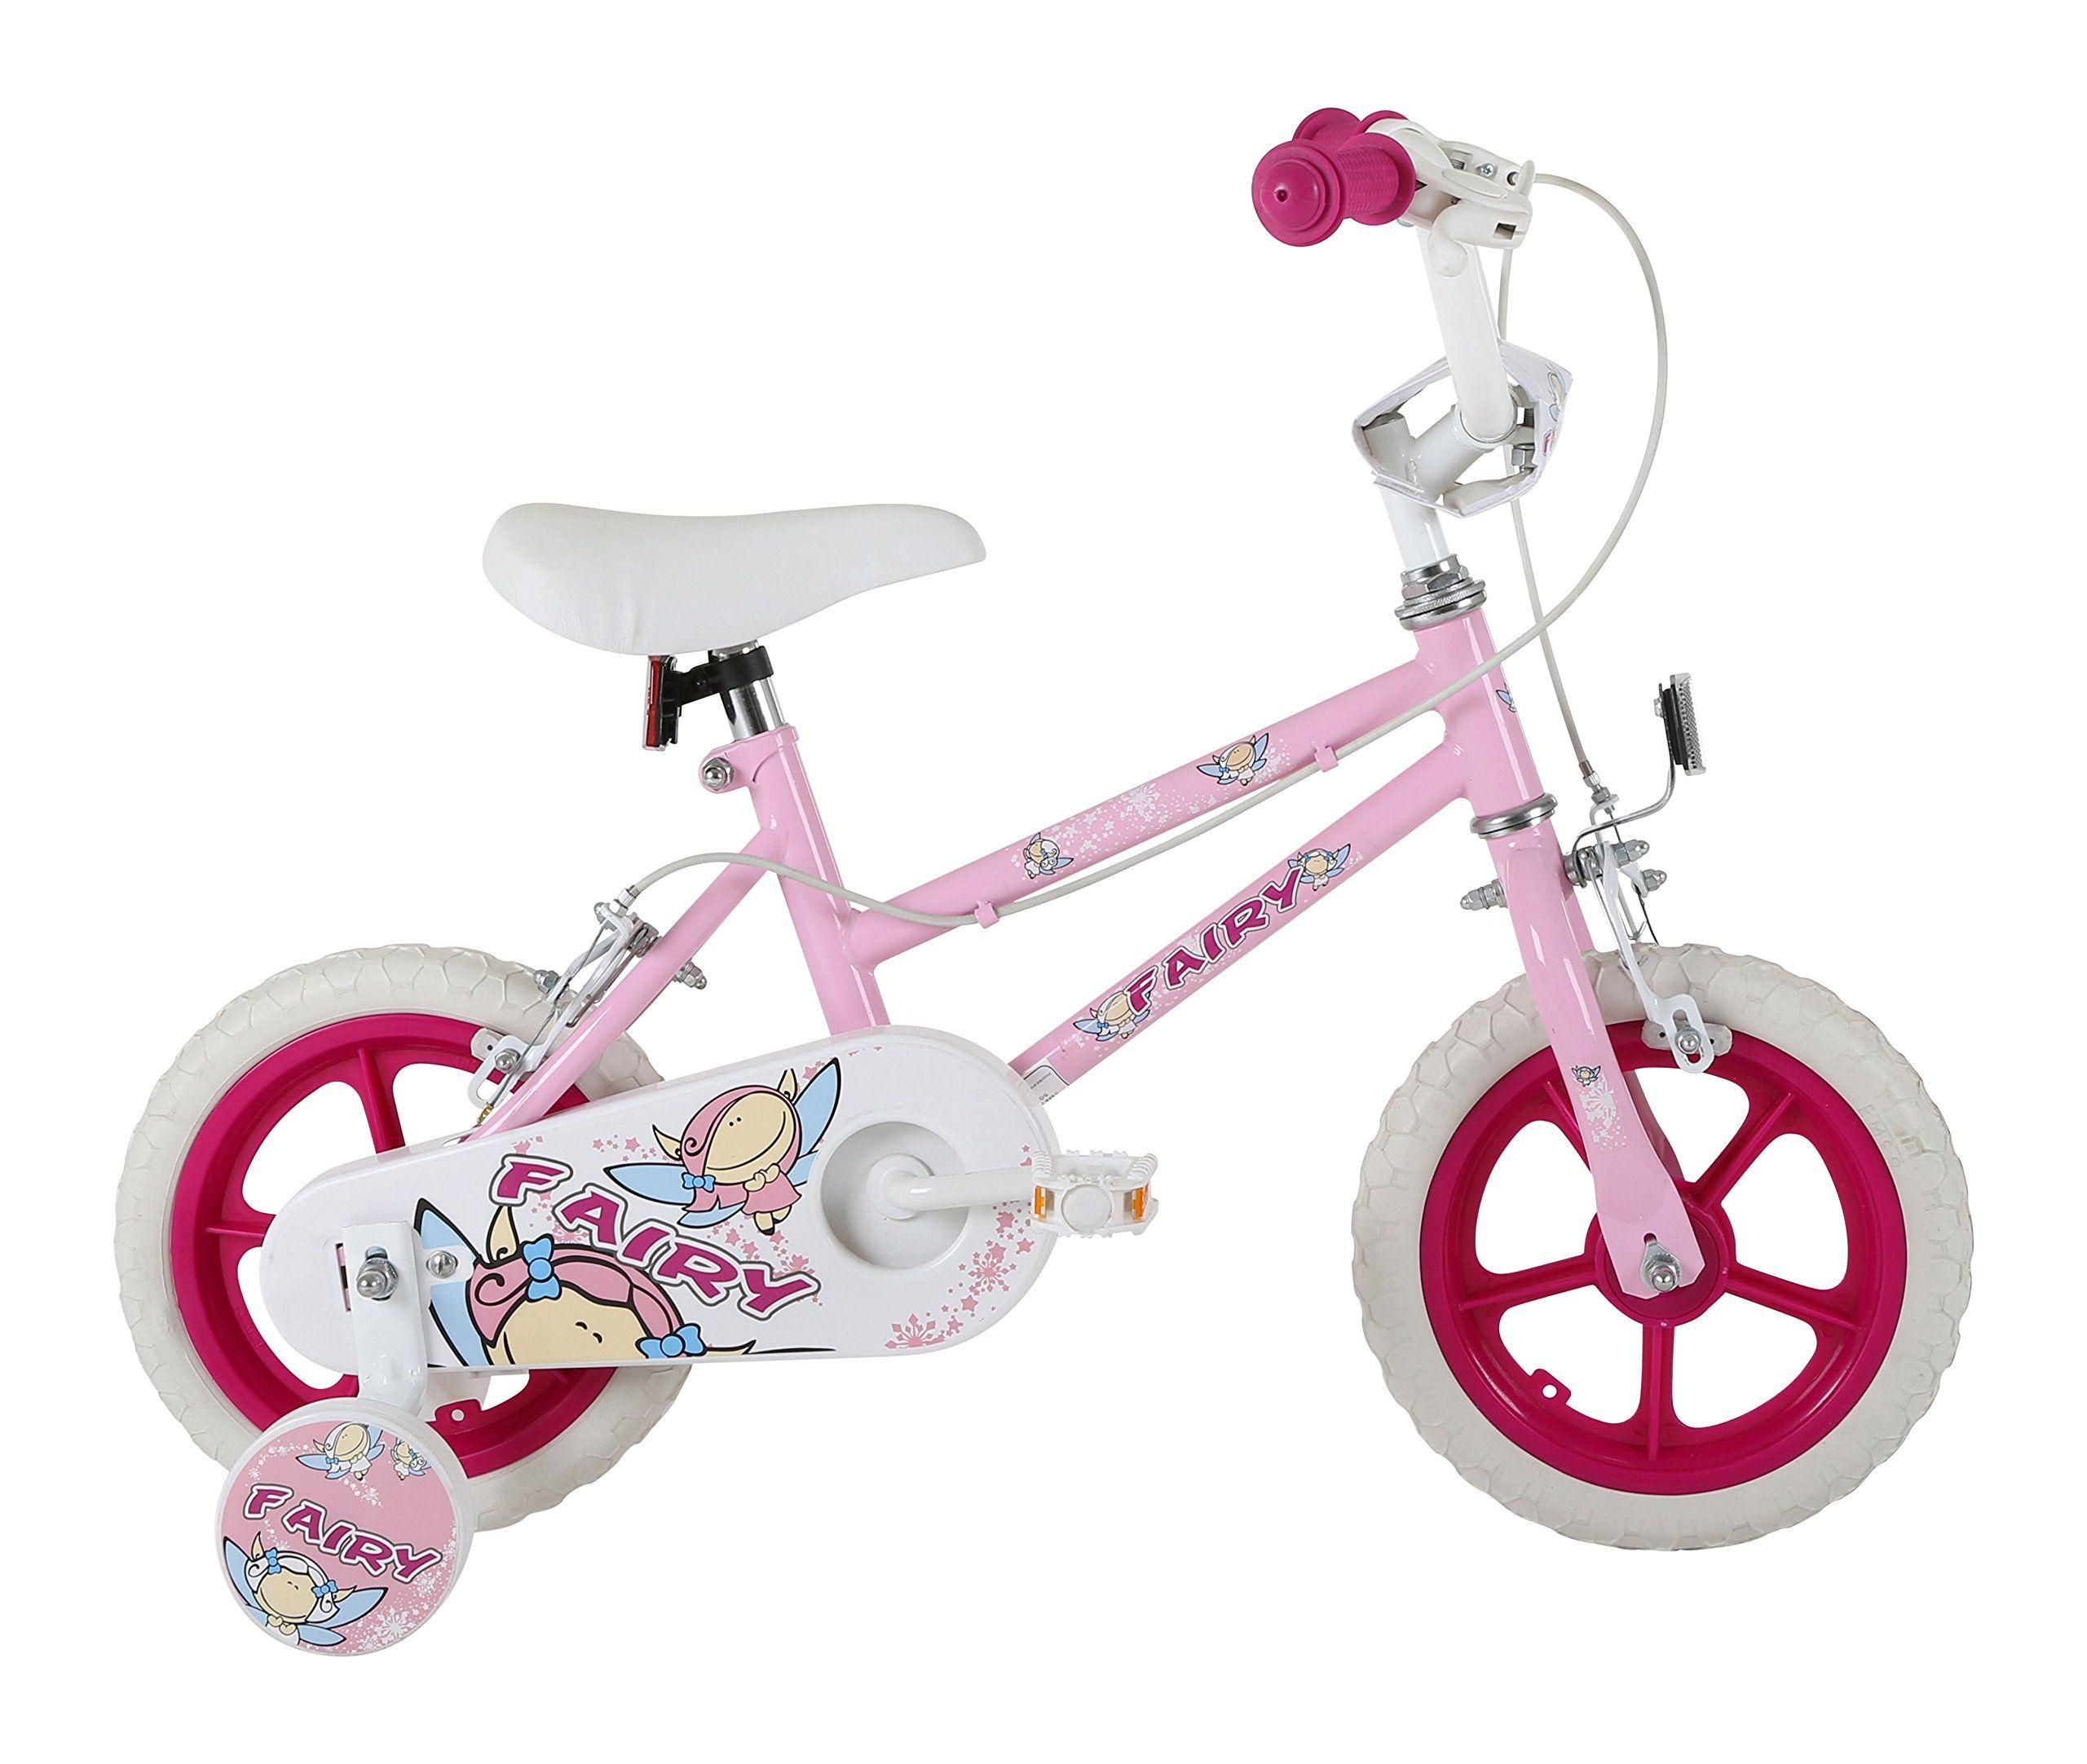 12 Wheel Play Bike Includes Stabilisers 1 Speed Kids Bicycle